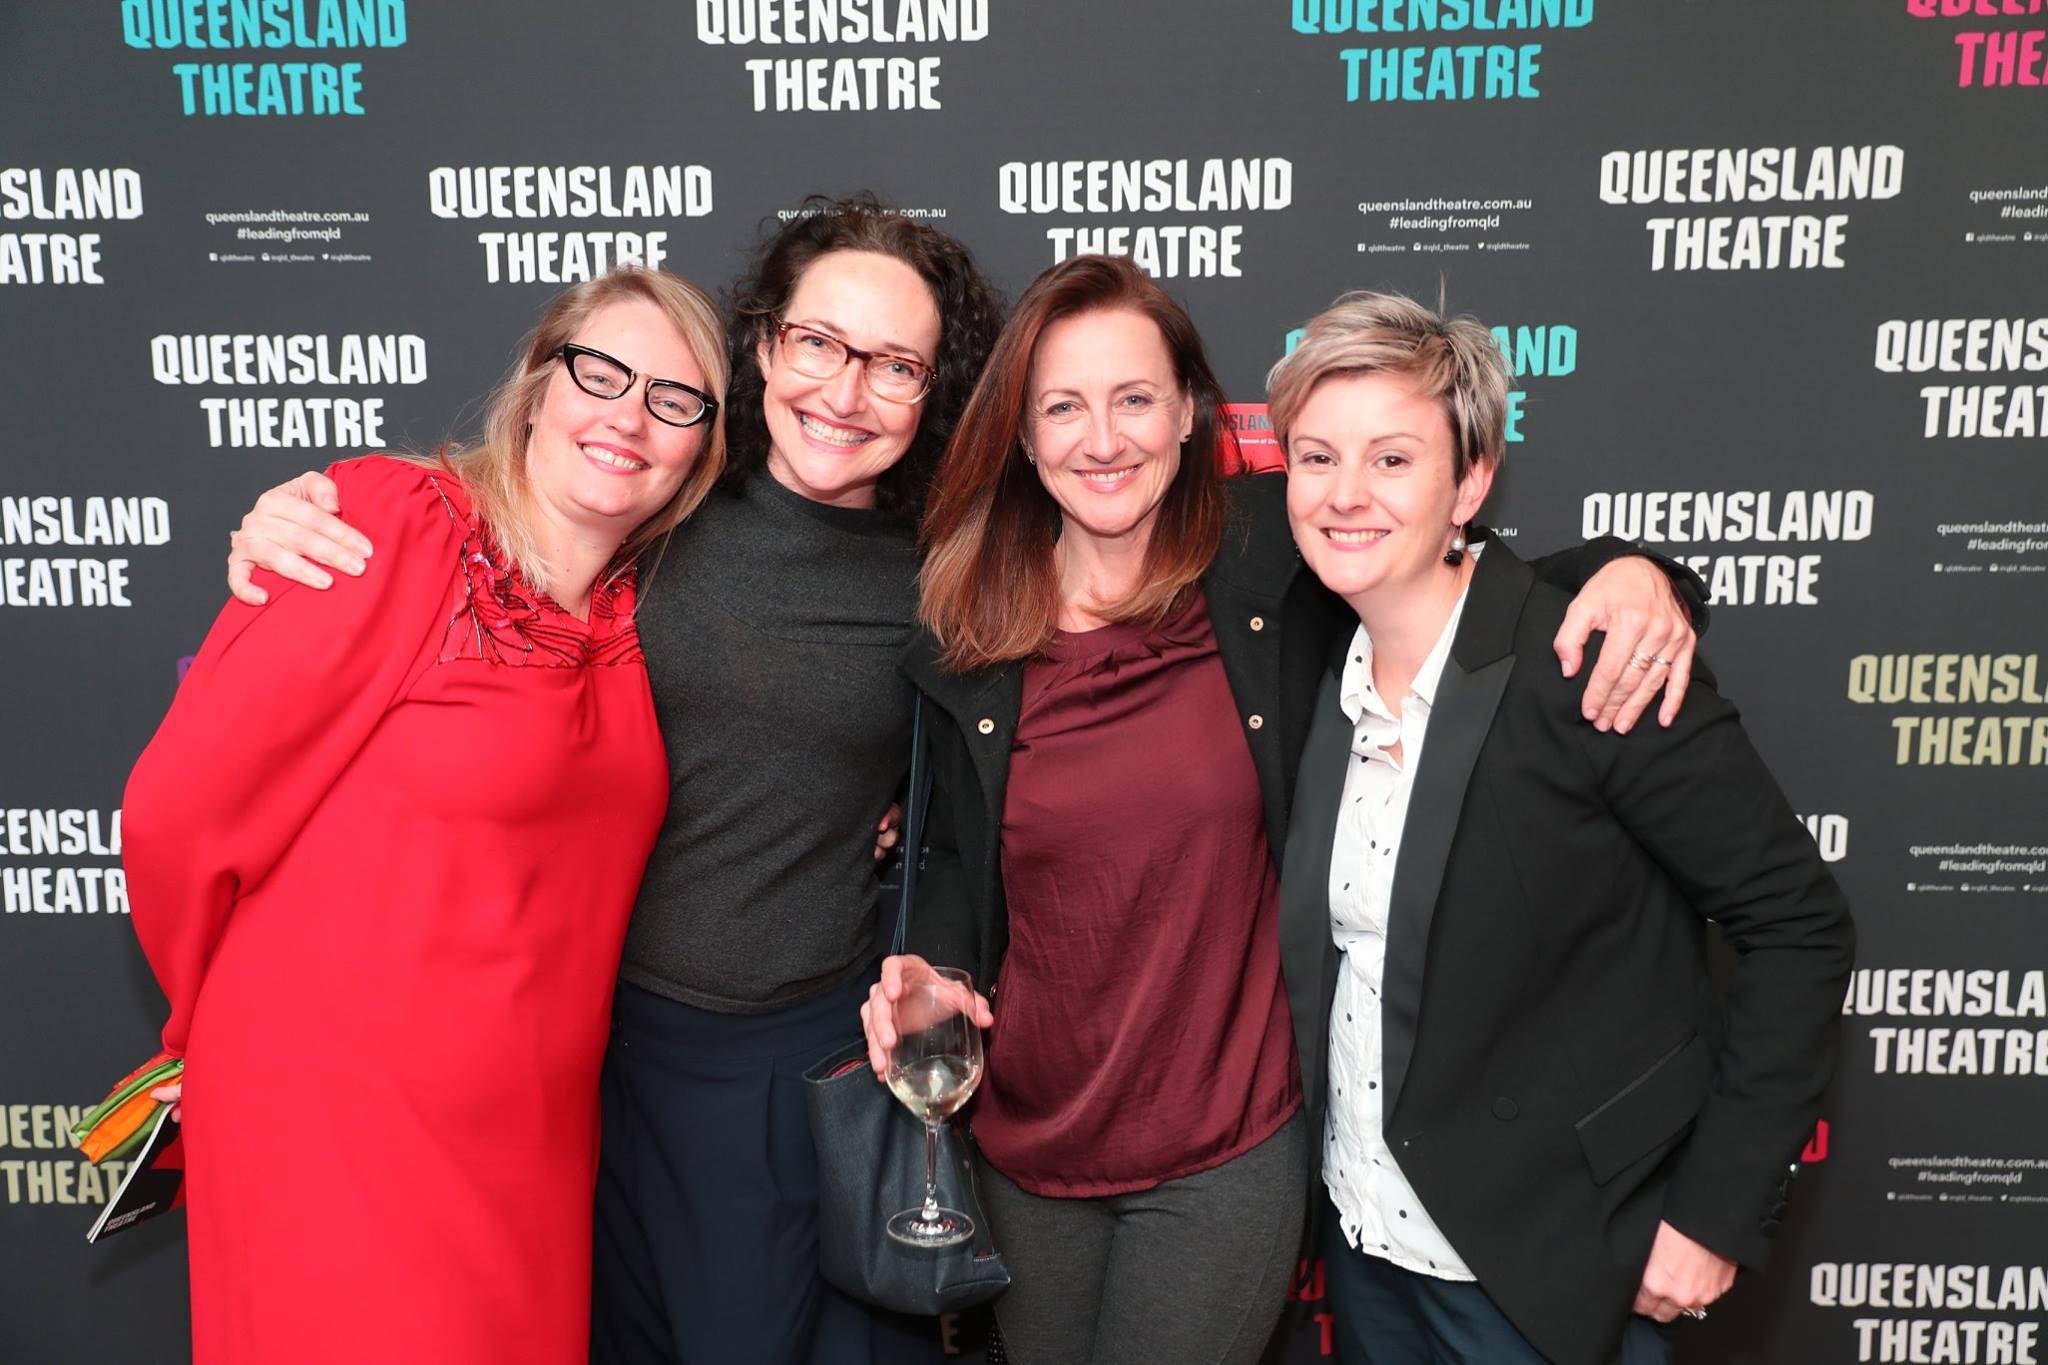 Kathryn Kelly, Katherine Lyall-Watson, Caroline Dunphy & Danielle Shankey.